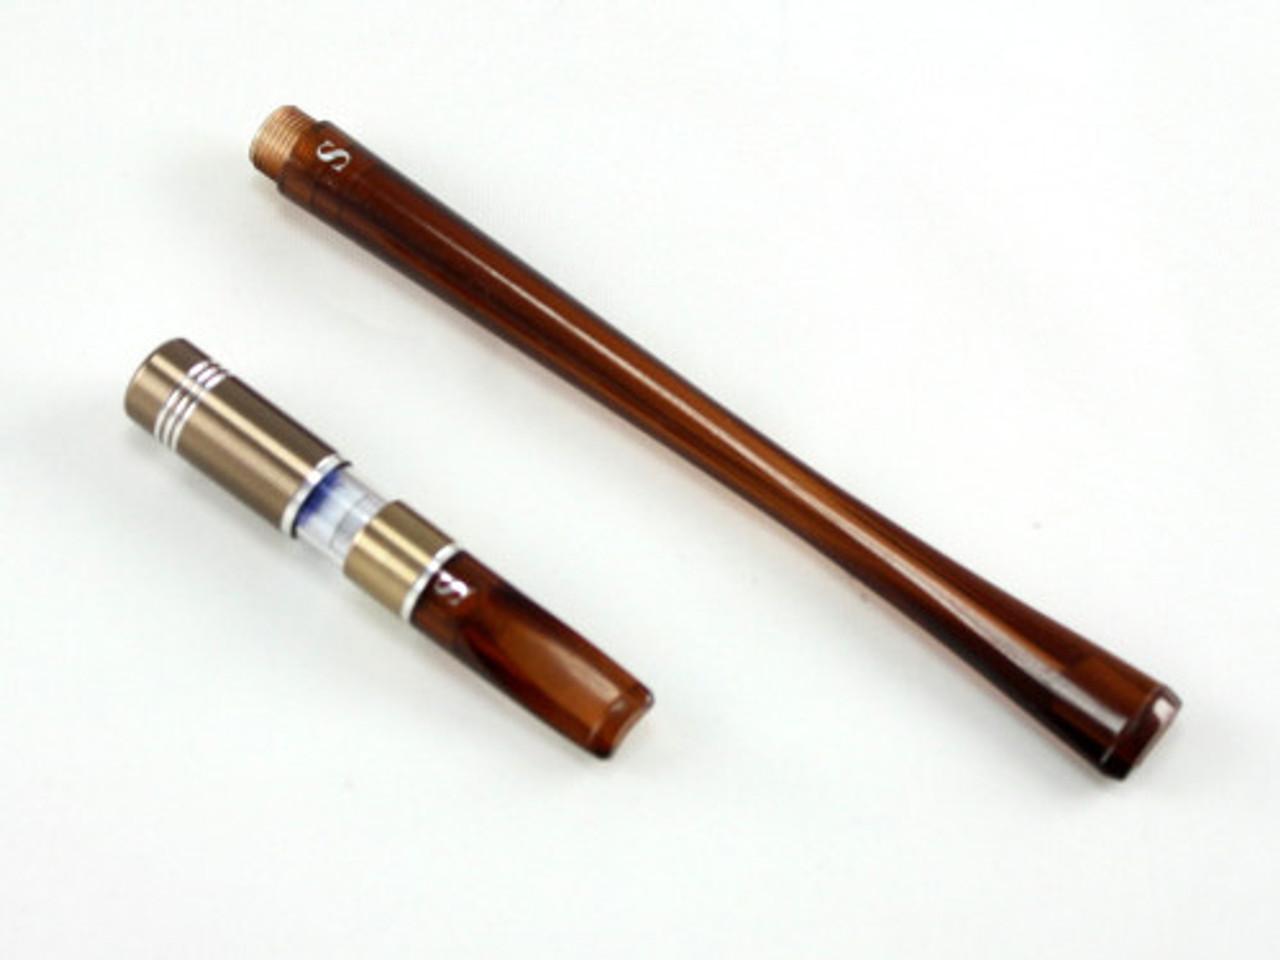 Double Filter Dual Cigarette Holder